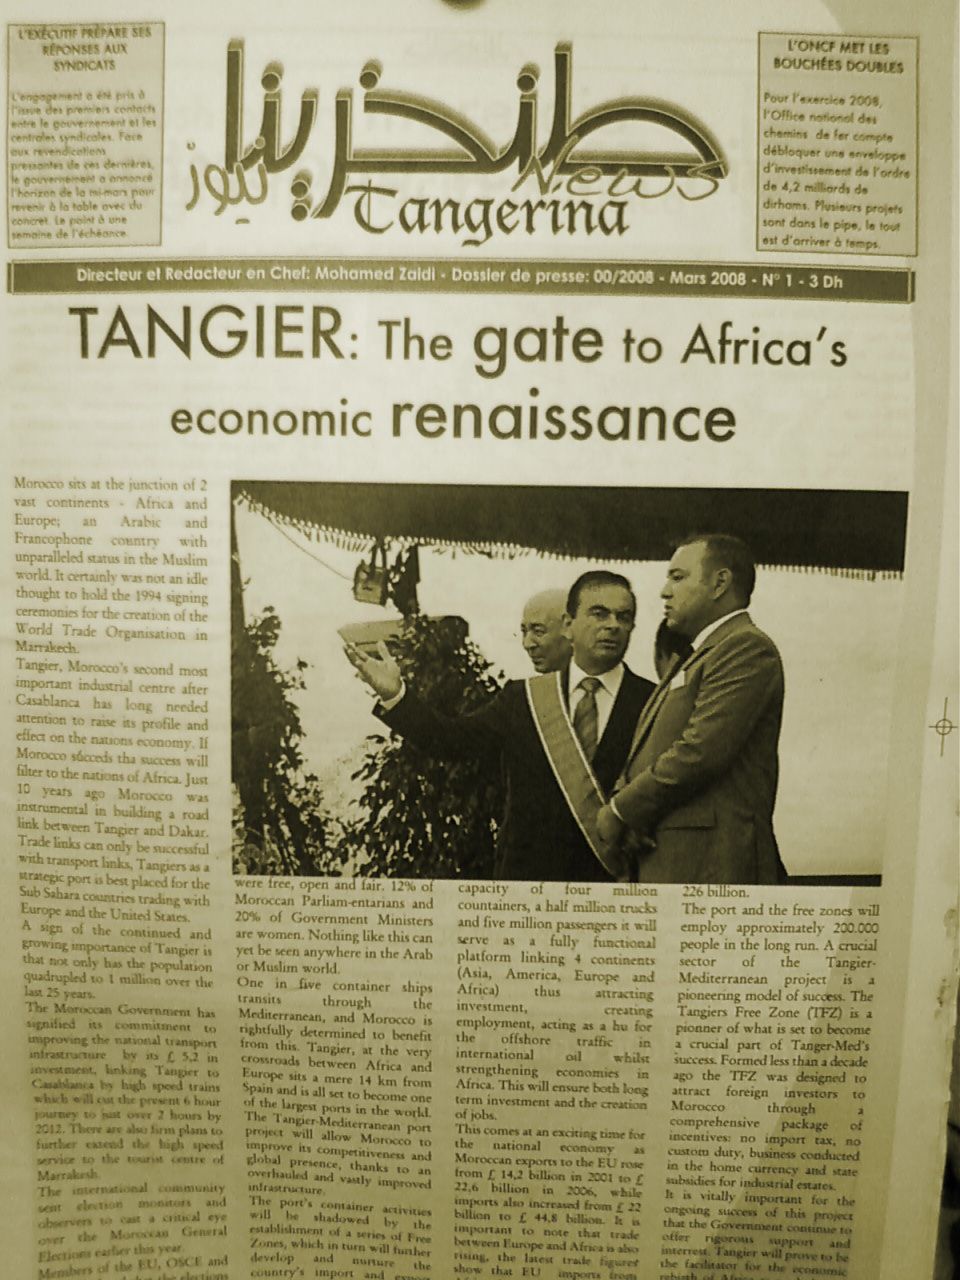 User:TANJERINA NEWS - Wikipedia, the free encyclopedia